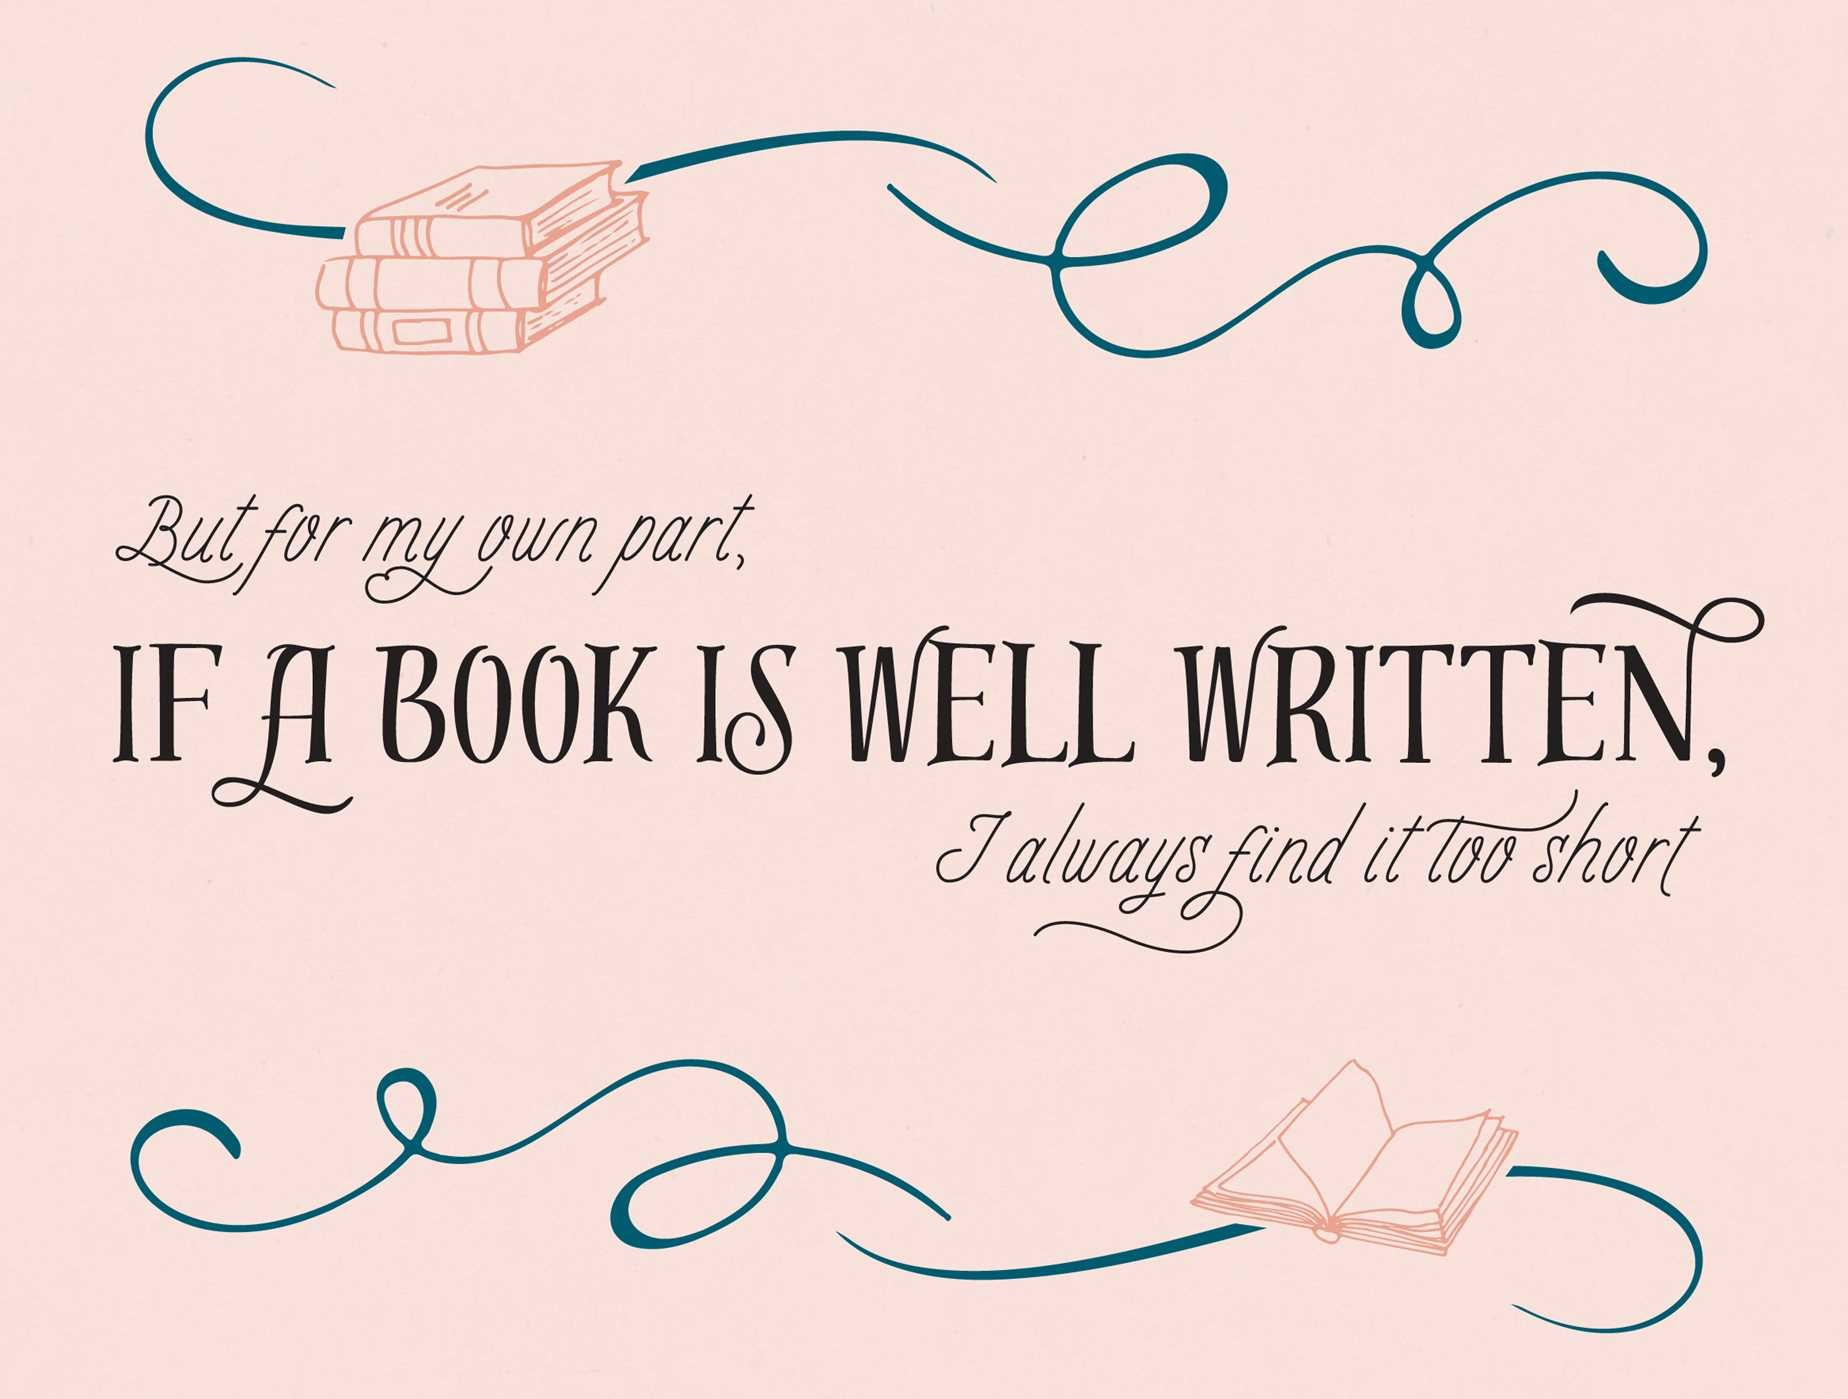 Literary stationery sets jane austen 9781683831037.in05